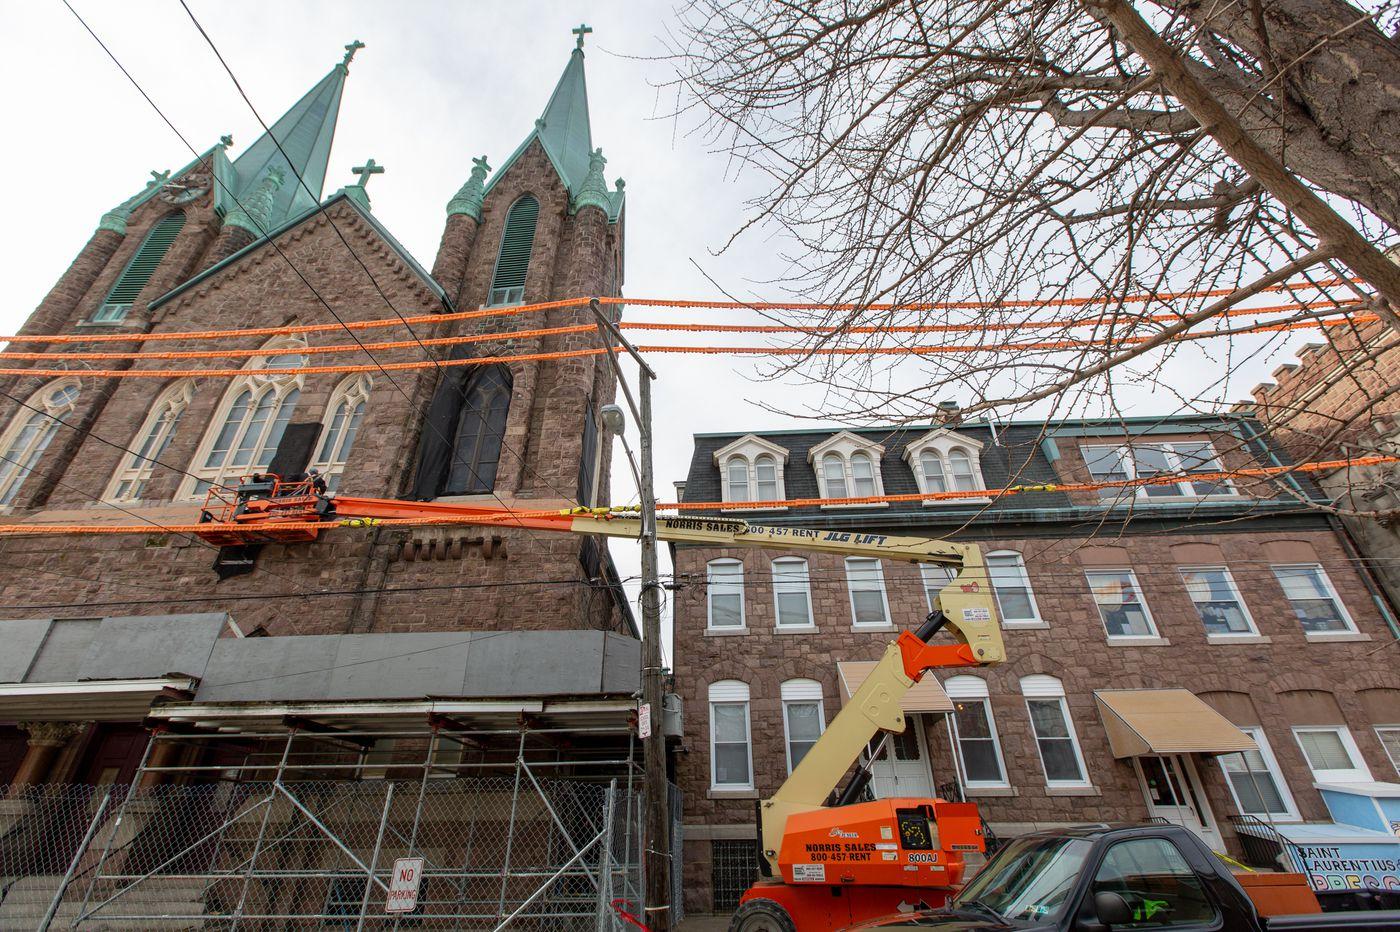 L&I: St. Laurentius church in Fishtown not as dangerous as development team claims